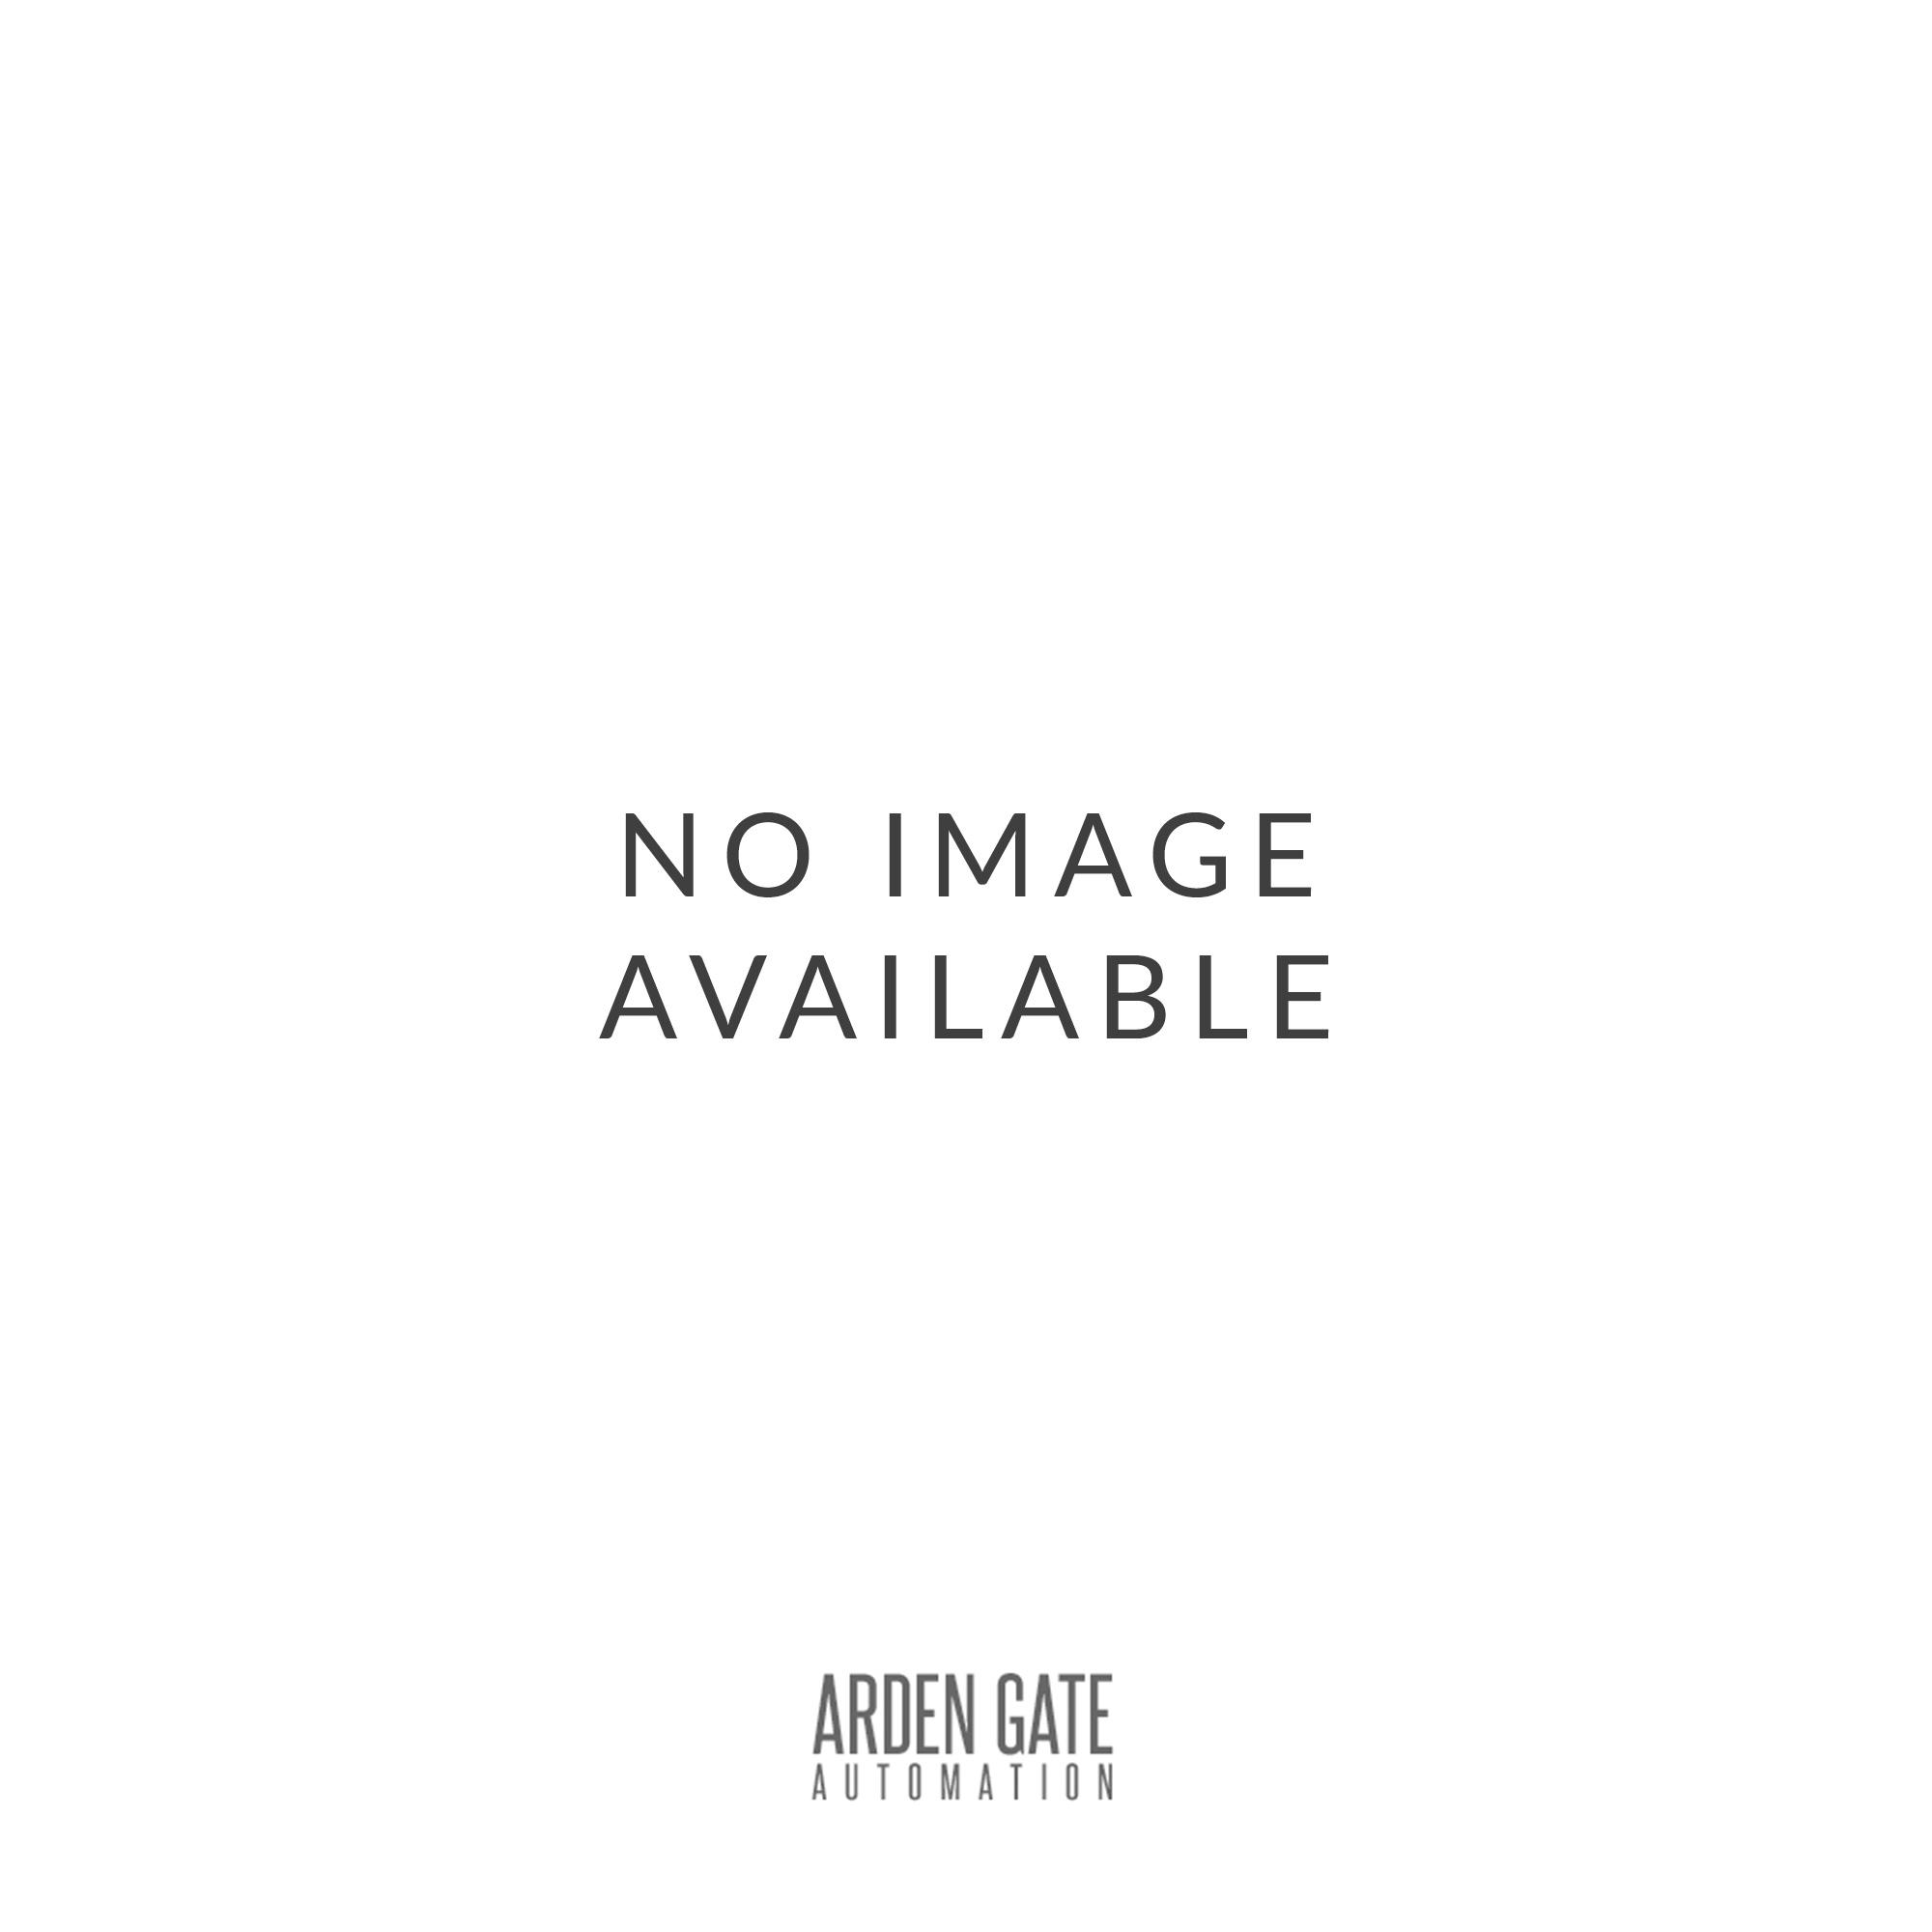 SIGNET LOCKS LOCO1030 ornamental style Locinox lock for gate frames 10mm to 30mm